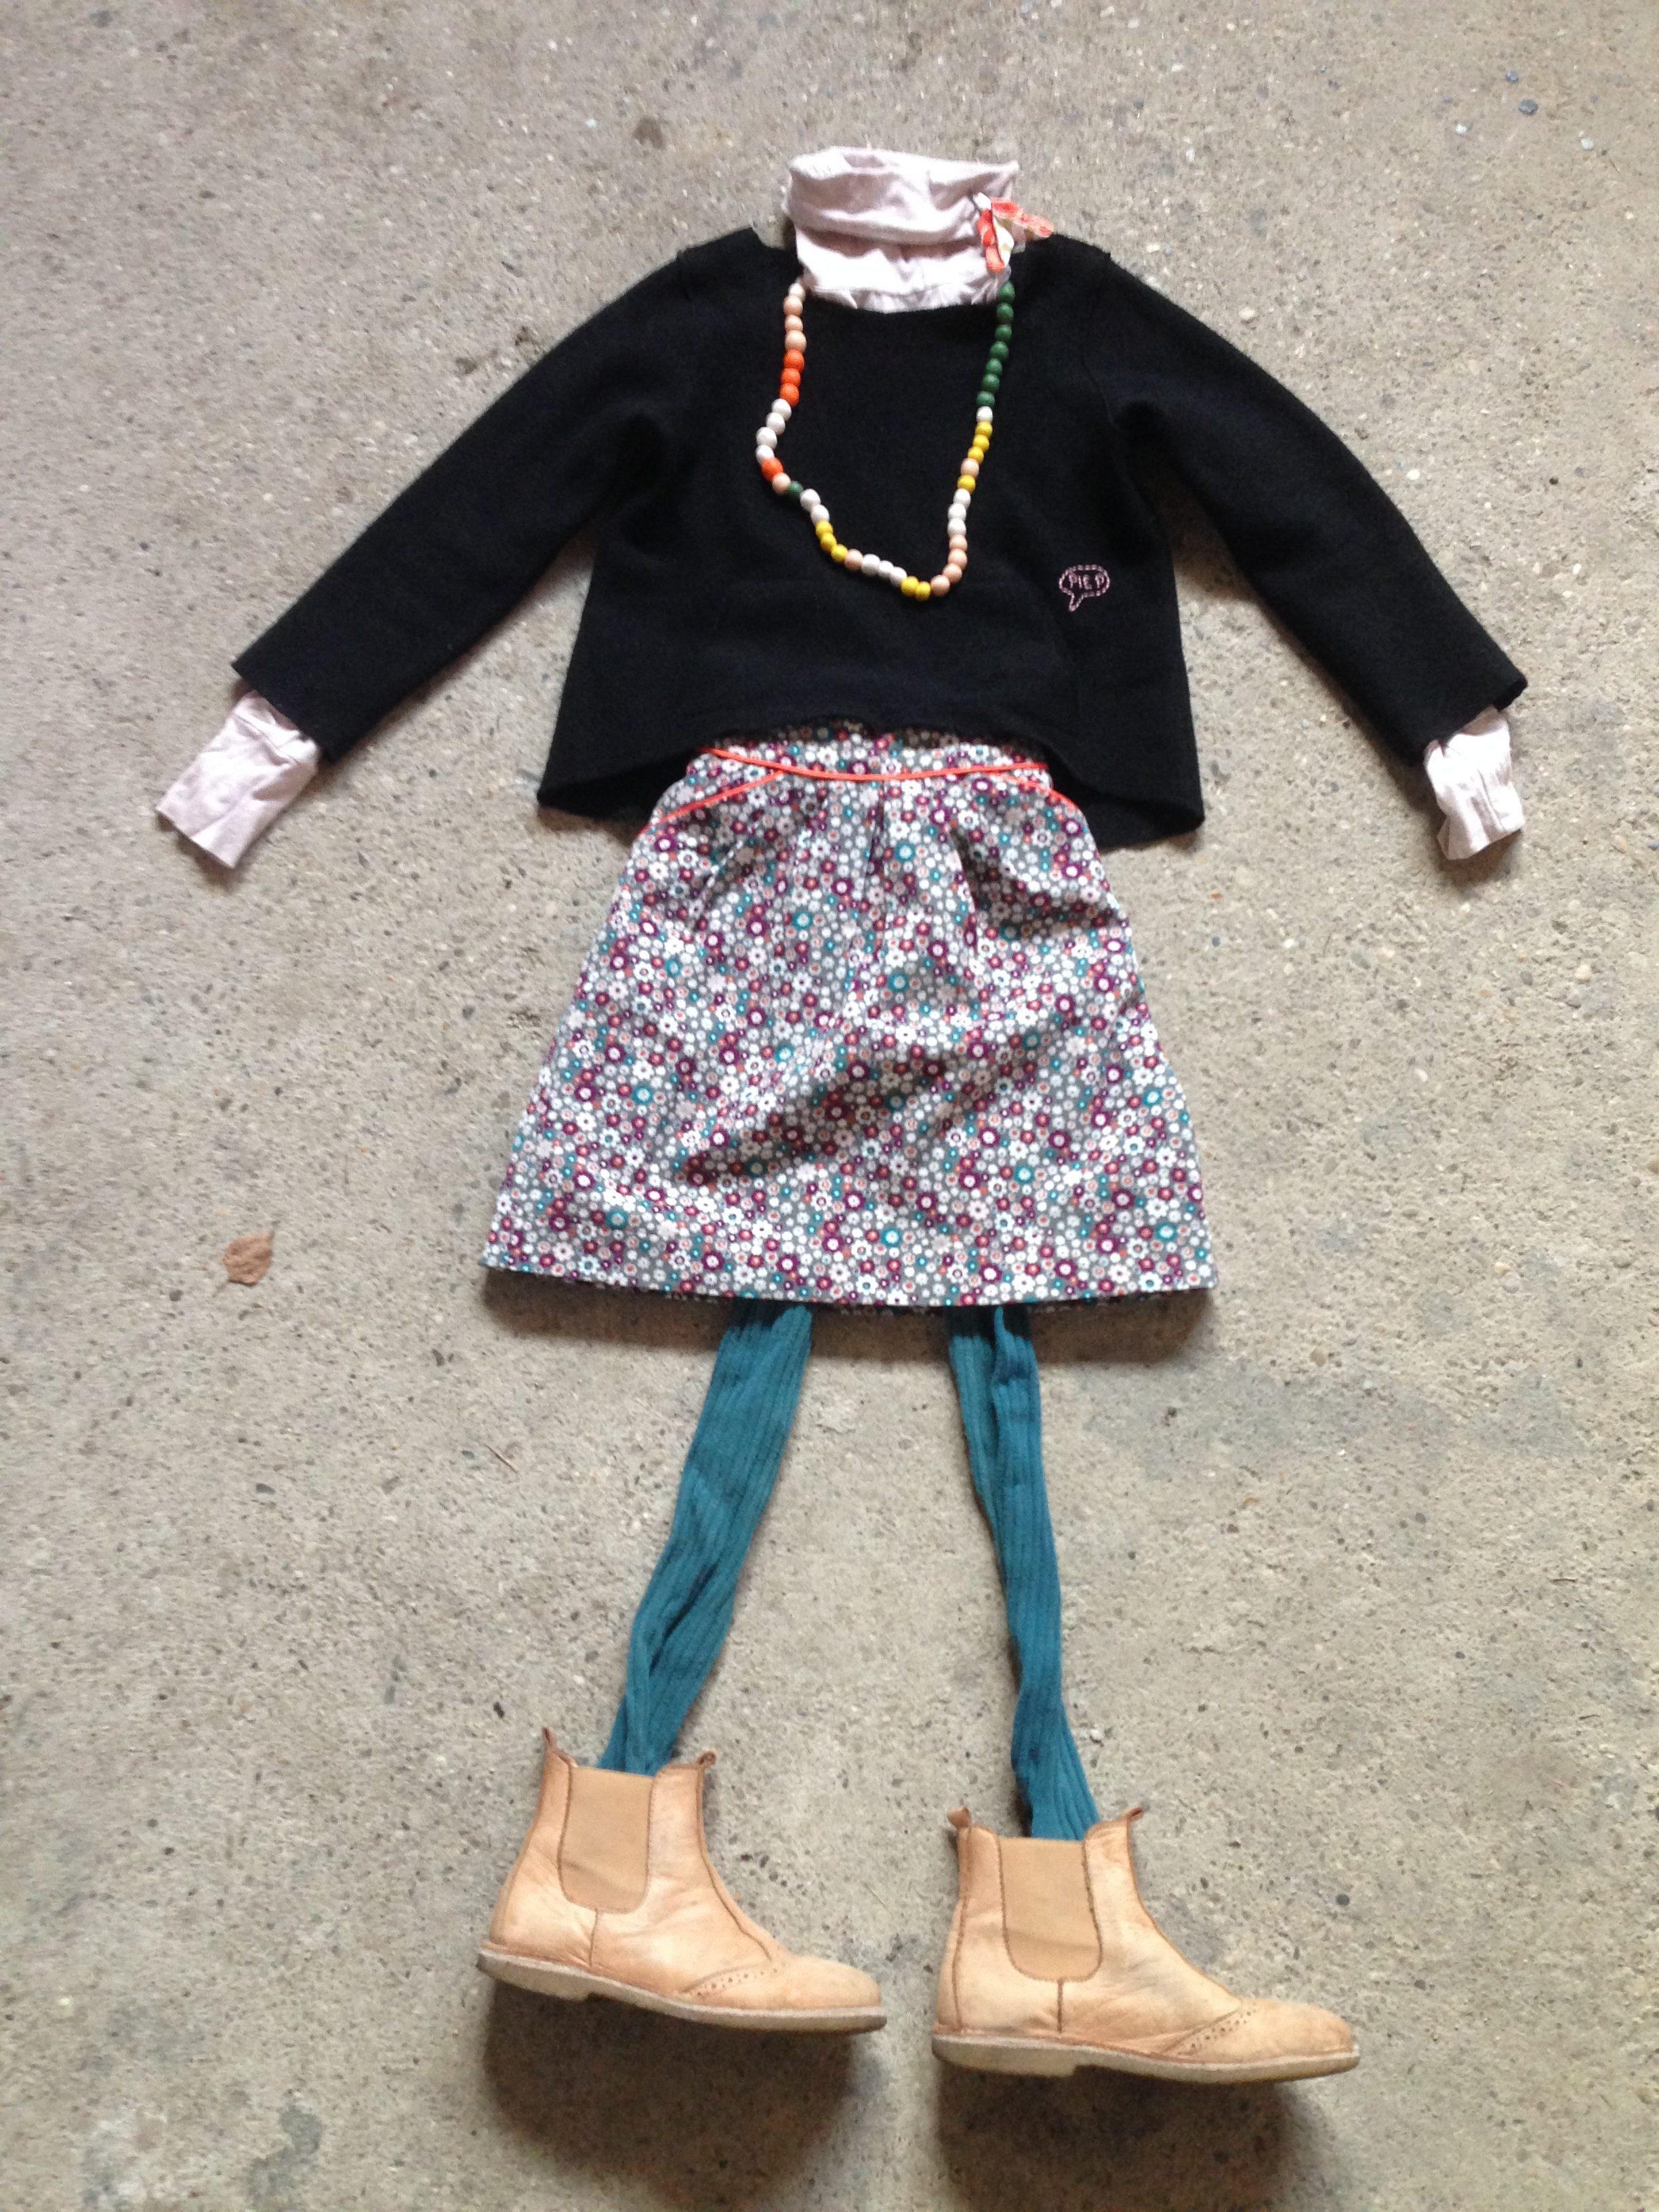 kleinformat mini perle rock Attaka pulloverschnitt